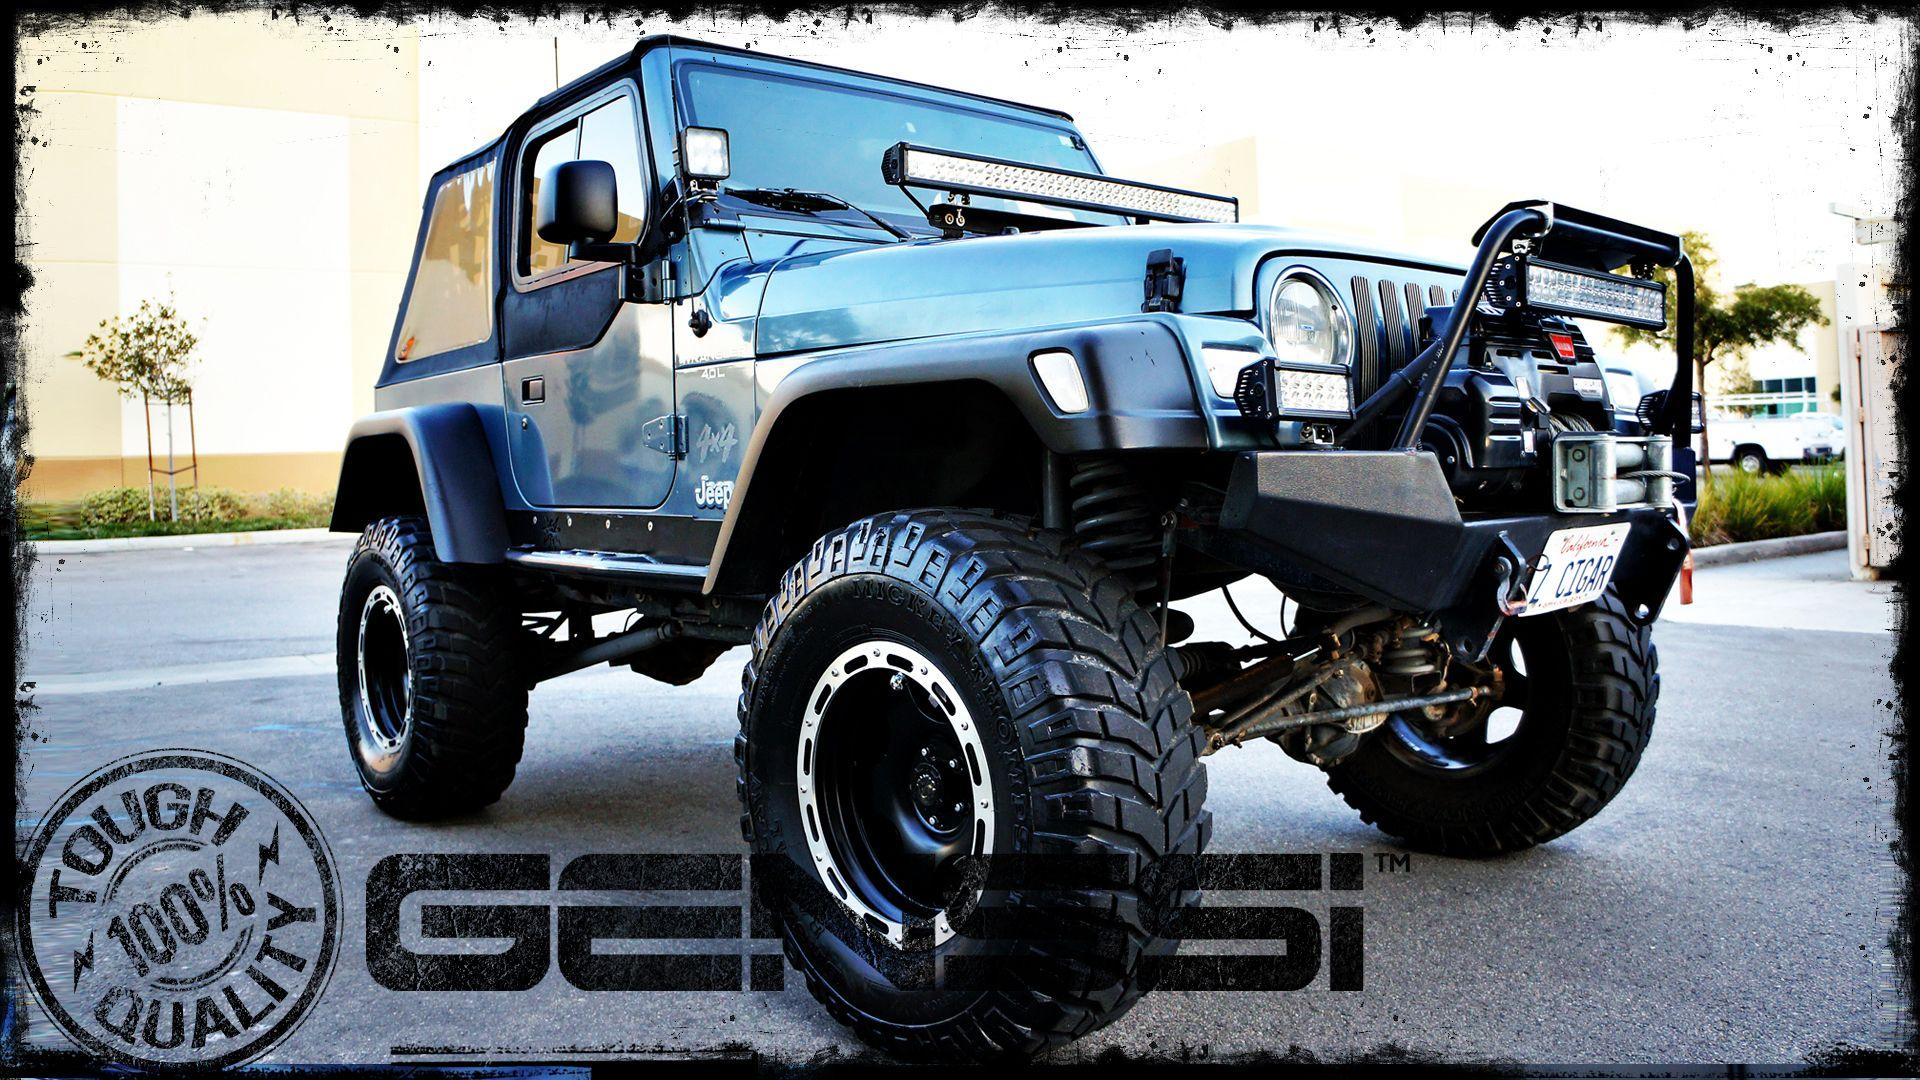 Jeep wranglers jk tj yj with custom light bars headlights grilles jeep wranglers jk tj yj with custom light bars headlights grilles hoods and aloadofball Choice Image